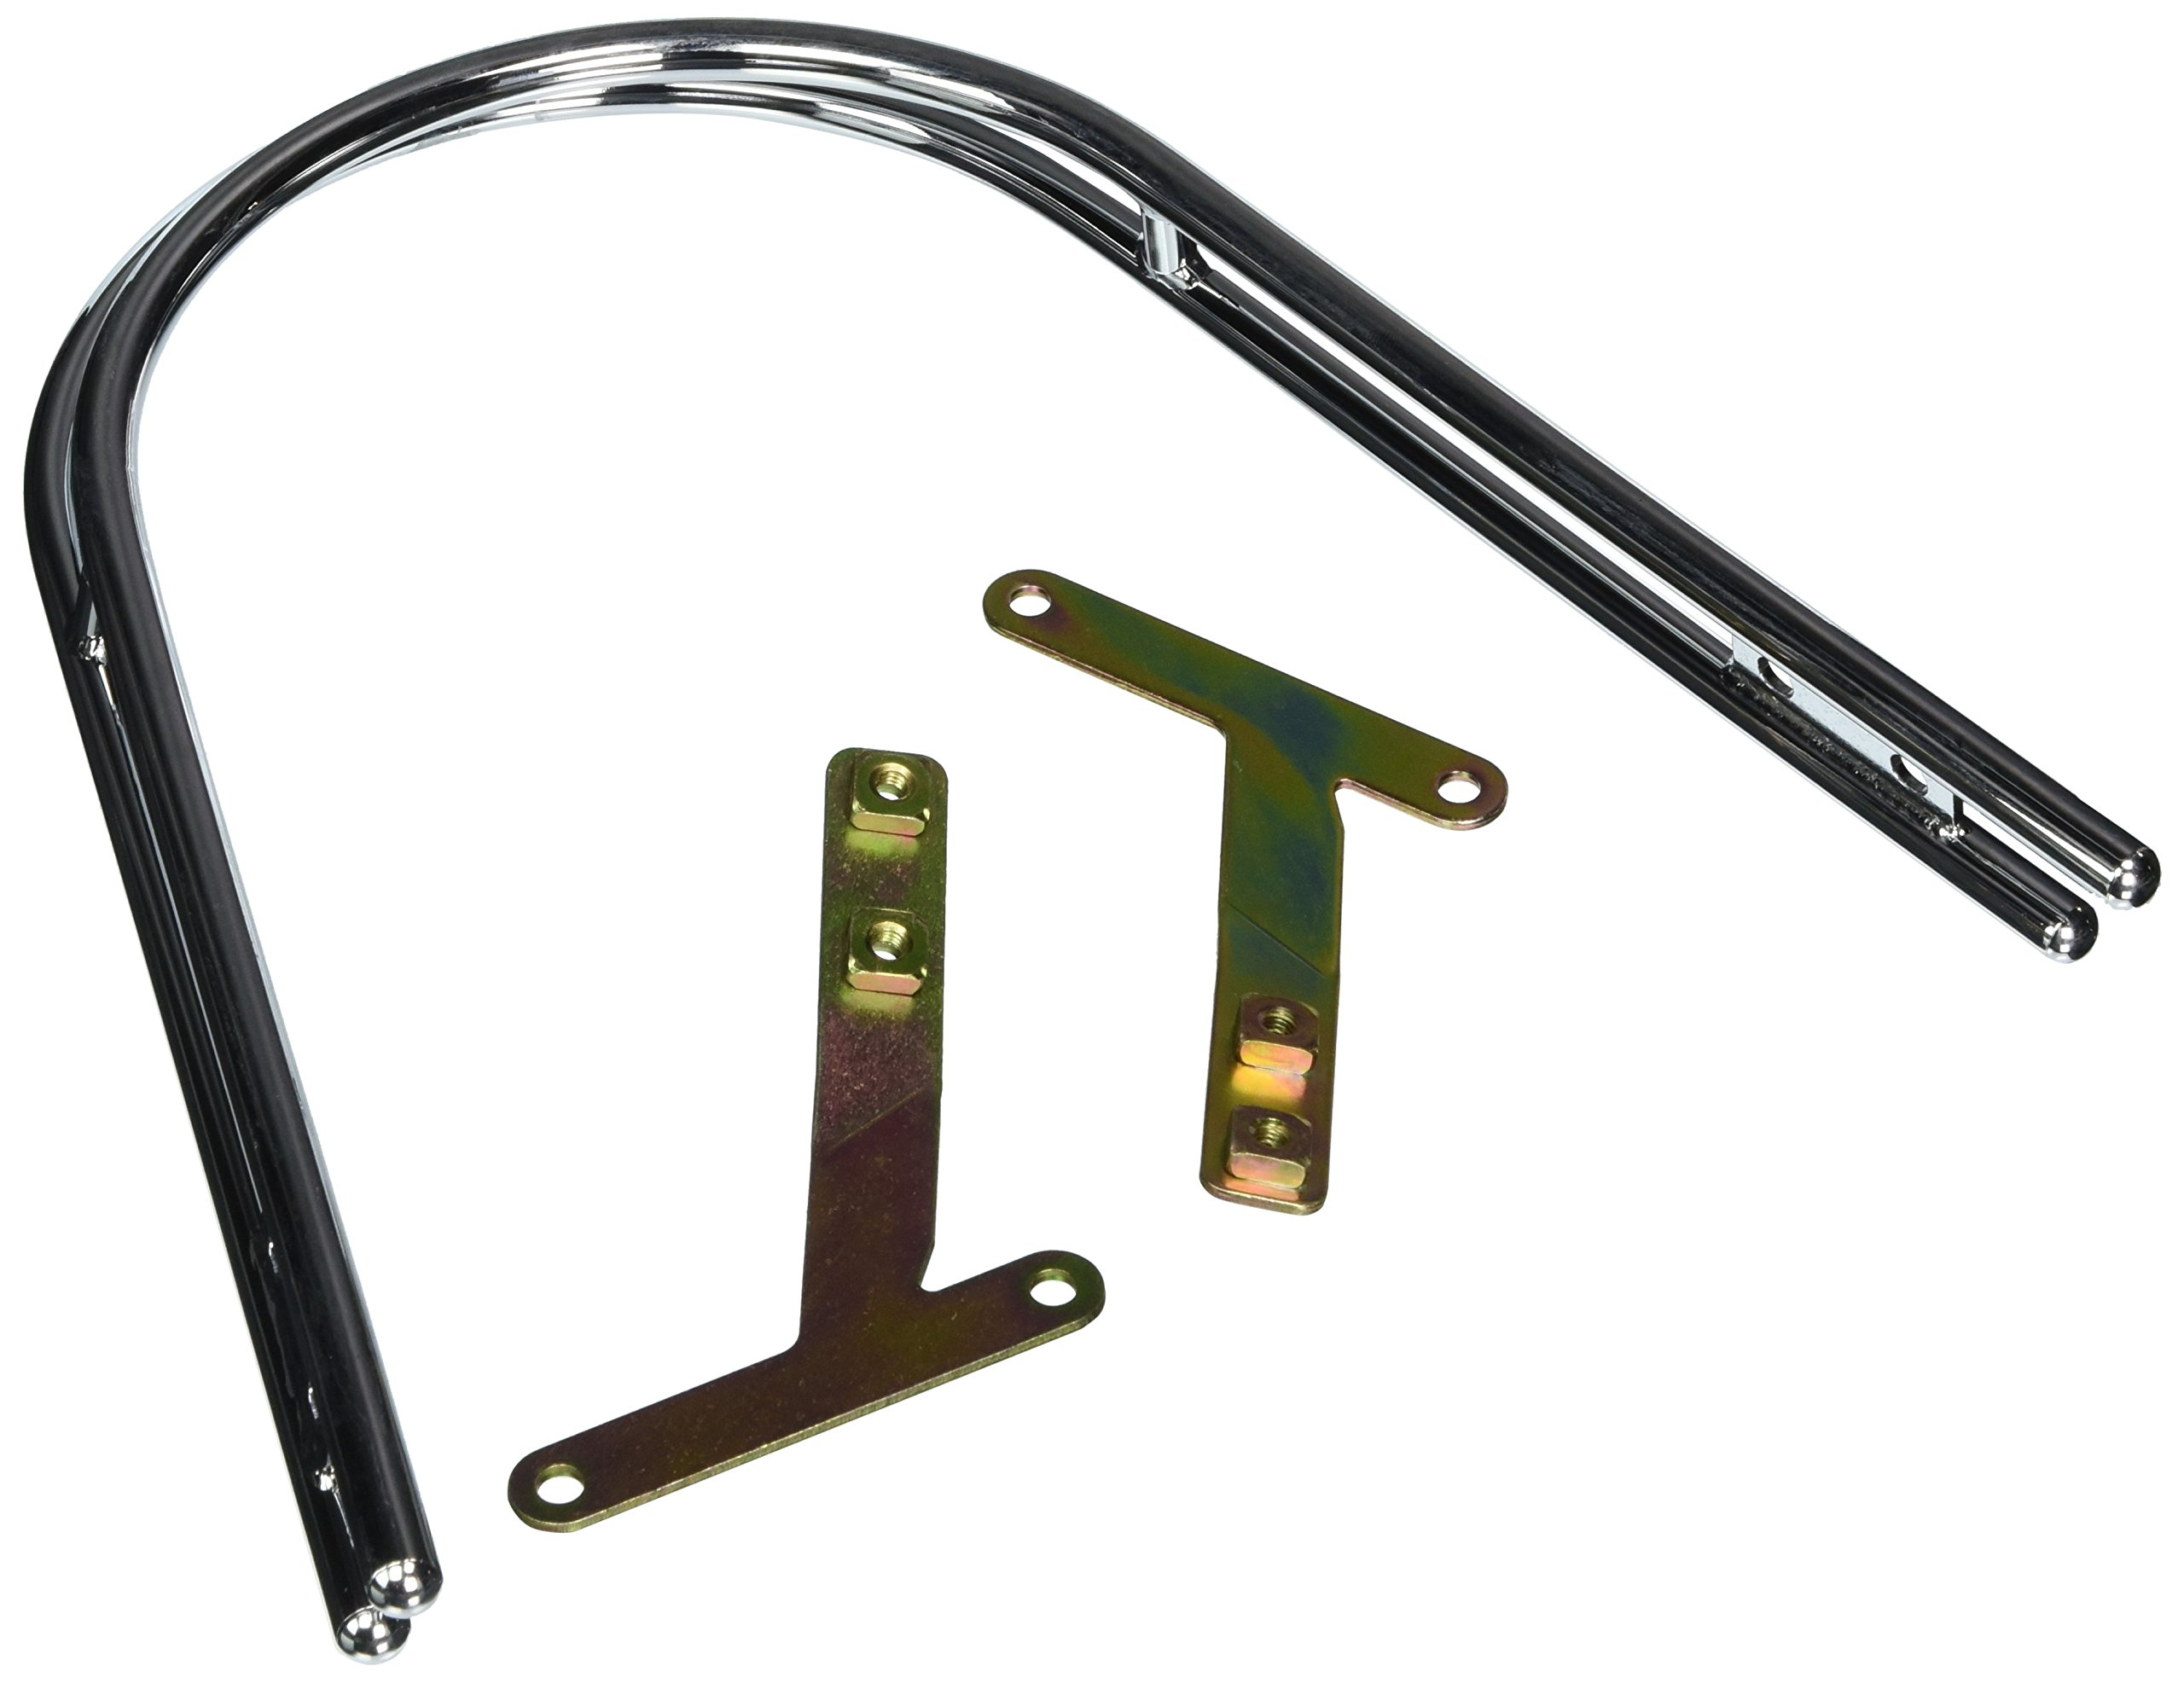 Honda Genuine Accessories 08P50-MCA-100 Chrome Front Fender Rail